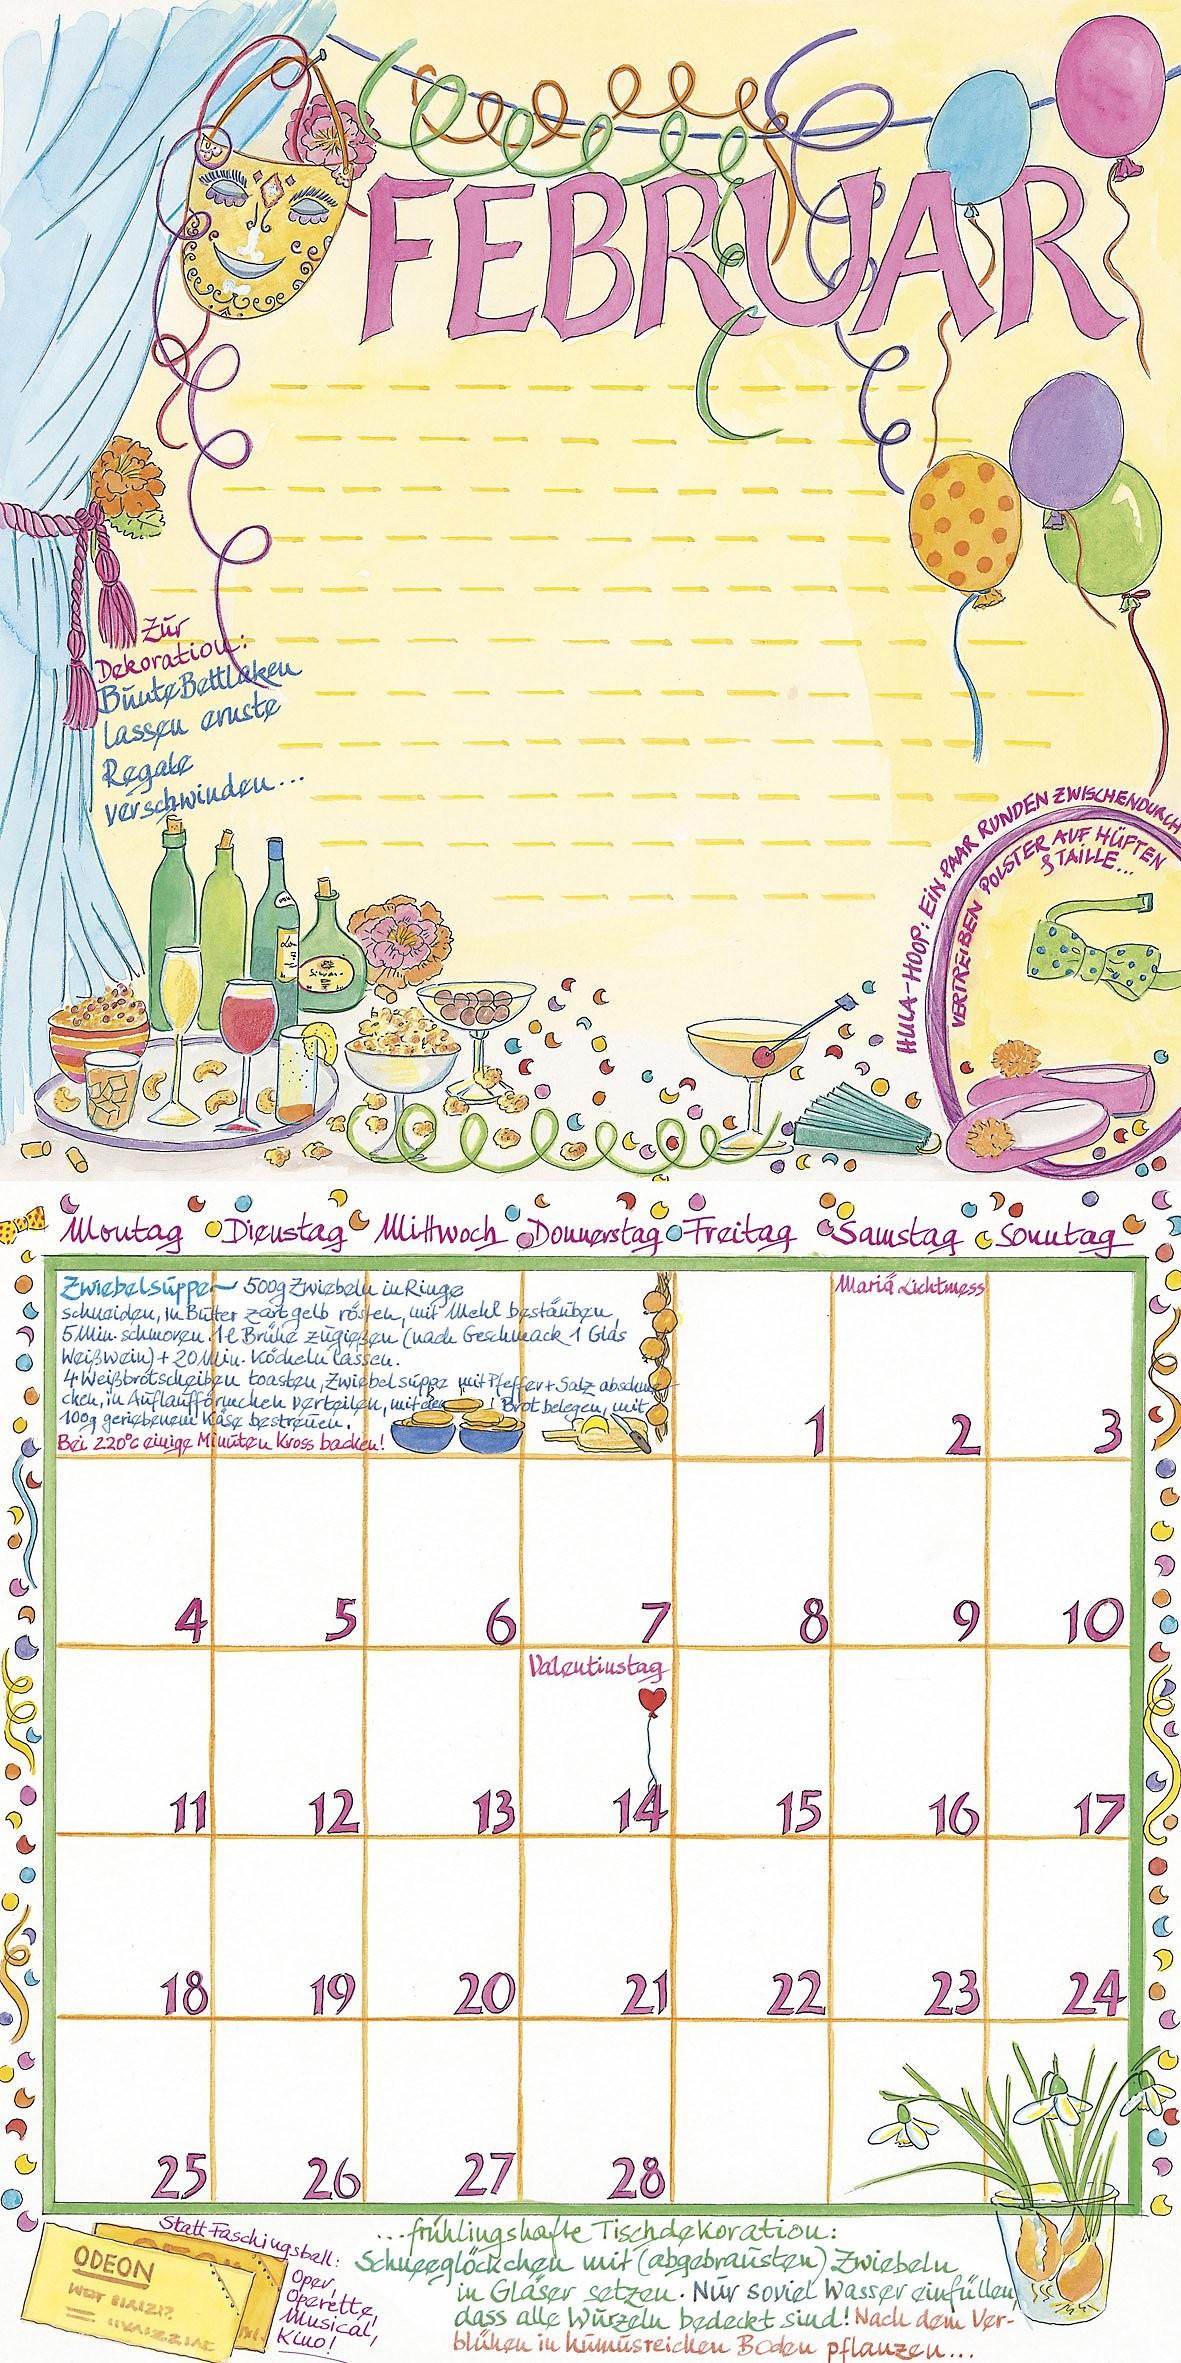 Calendar 2019 Planner Más Populares Merkkalender 2019 Kalender Günstig Bei Weltbild Bestellen Of Calendar 2019 Planner Actual Cavallini 2019 Desk Calendar Vintage Owls – Jenni Bick Bookbinding